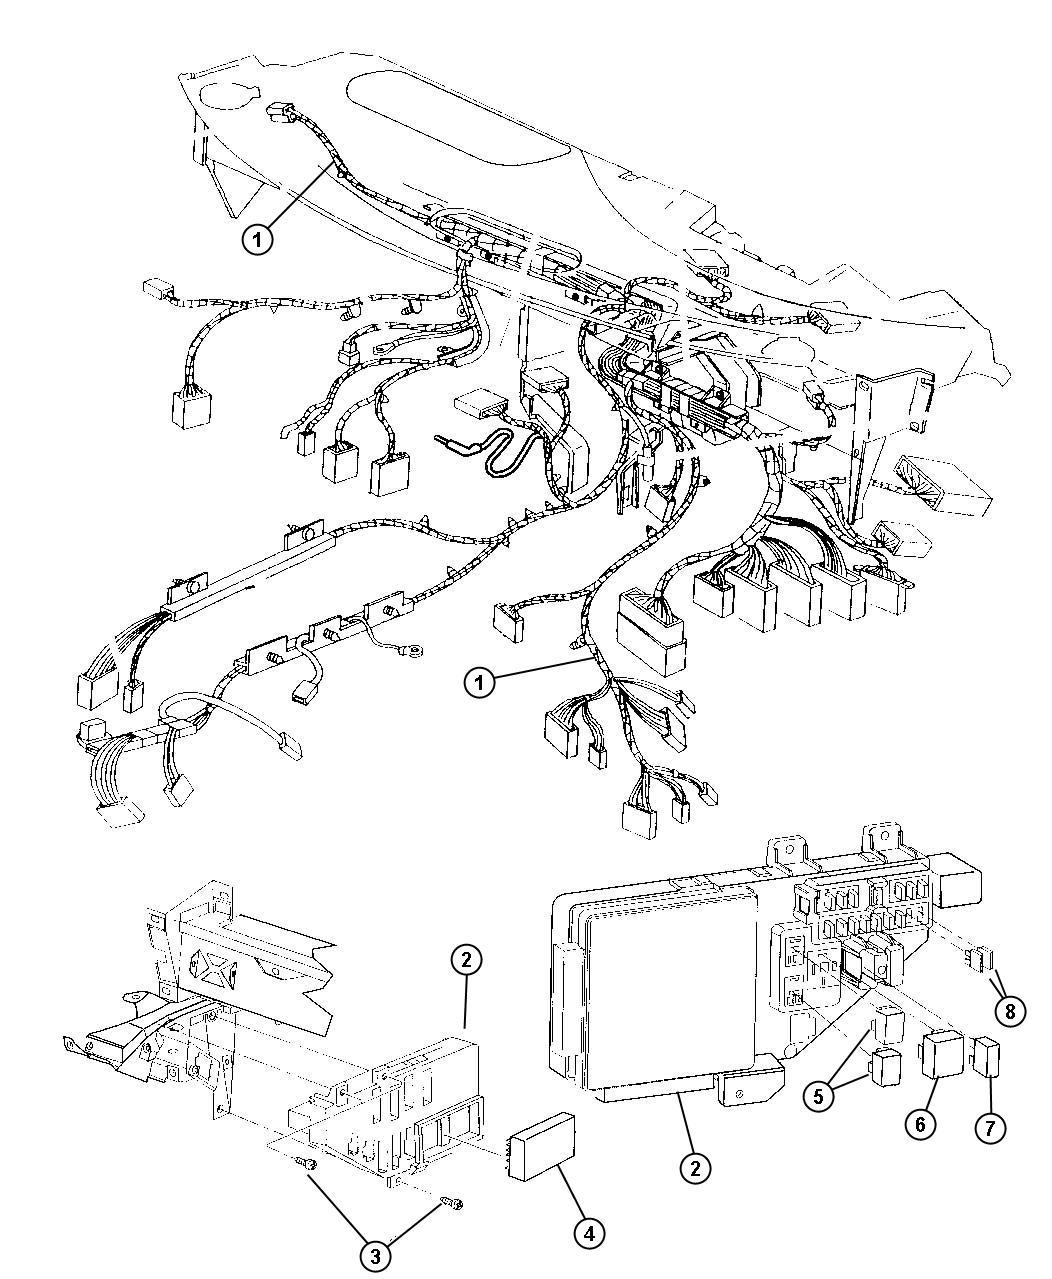 Timing belt on 2004 chrysler concorde factory wiring diagrams